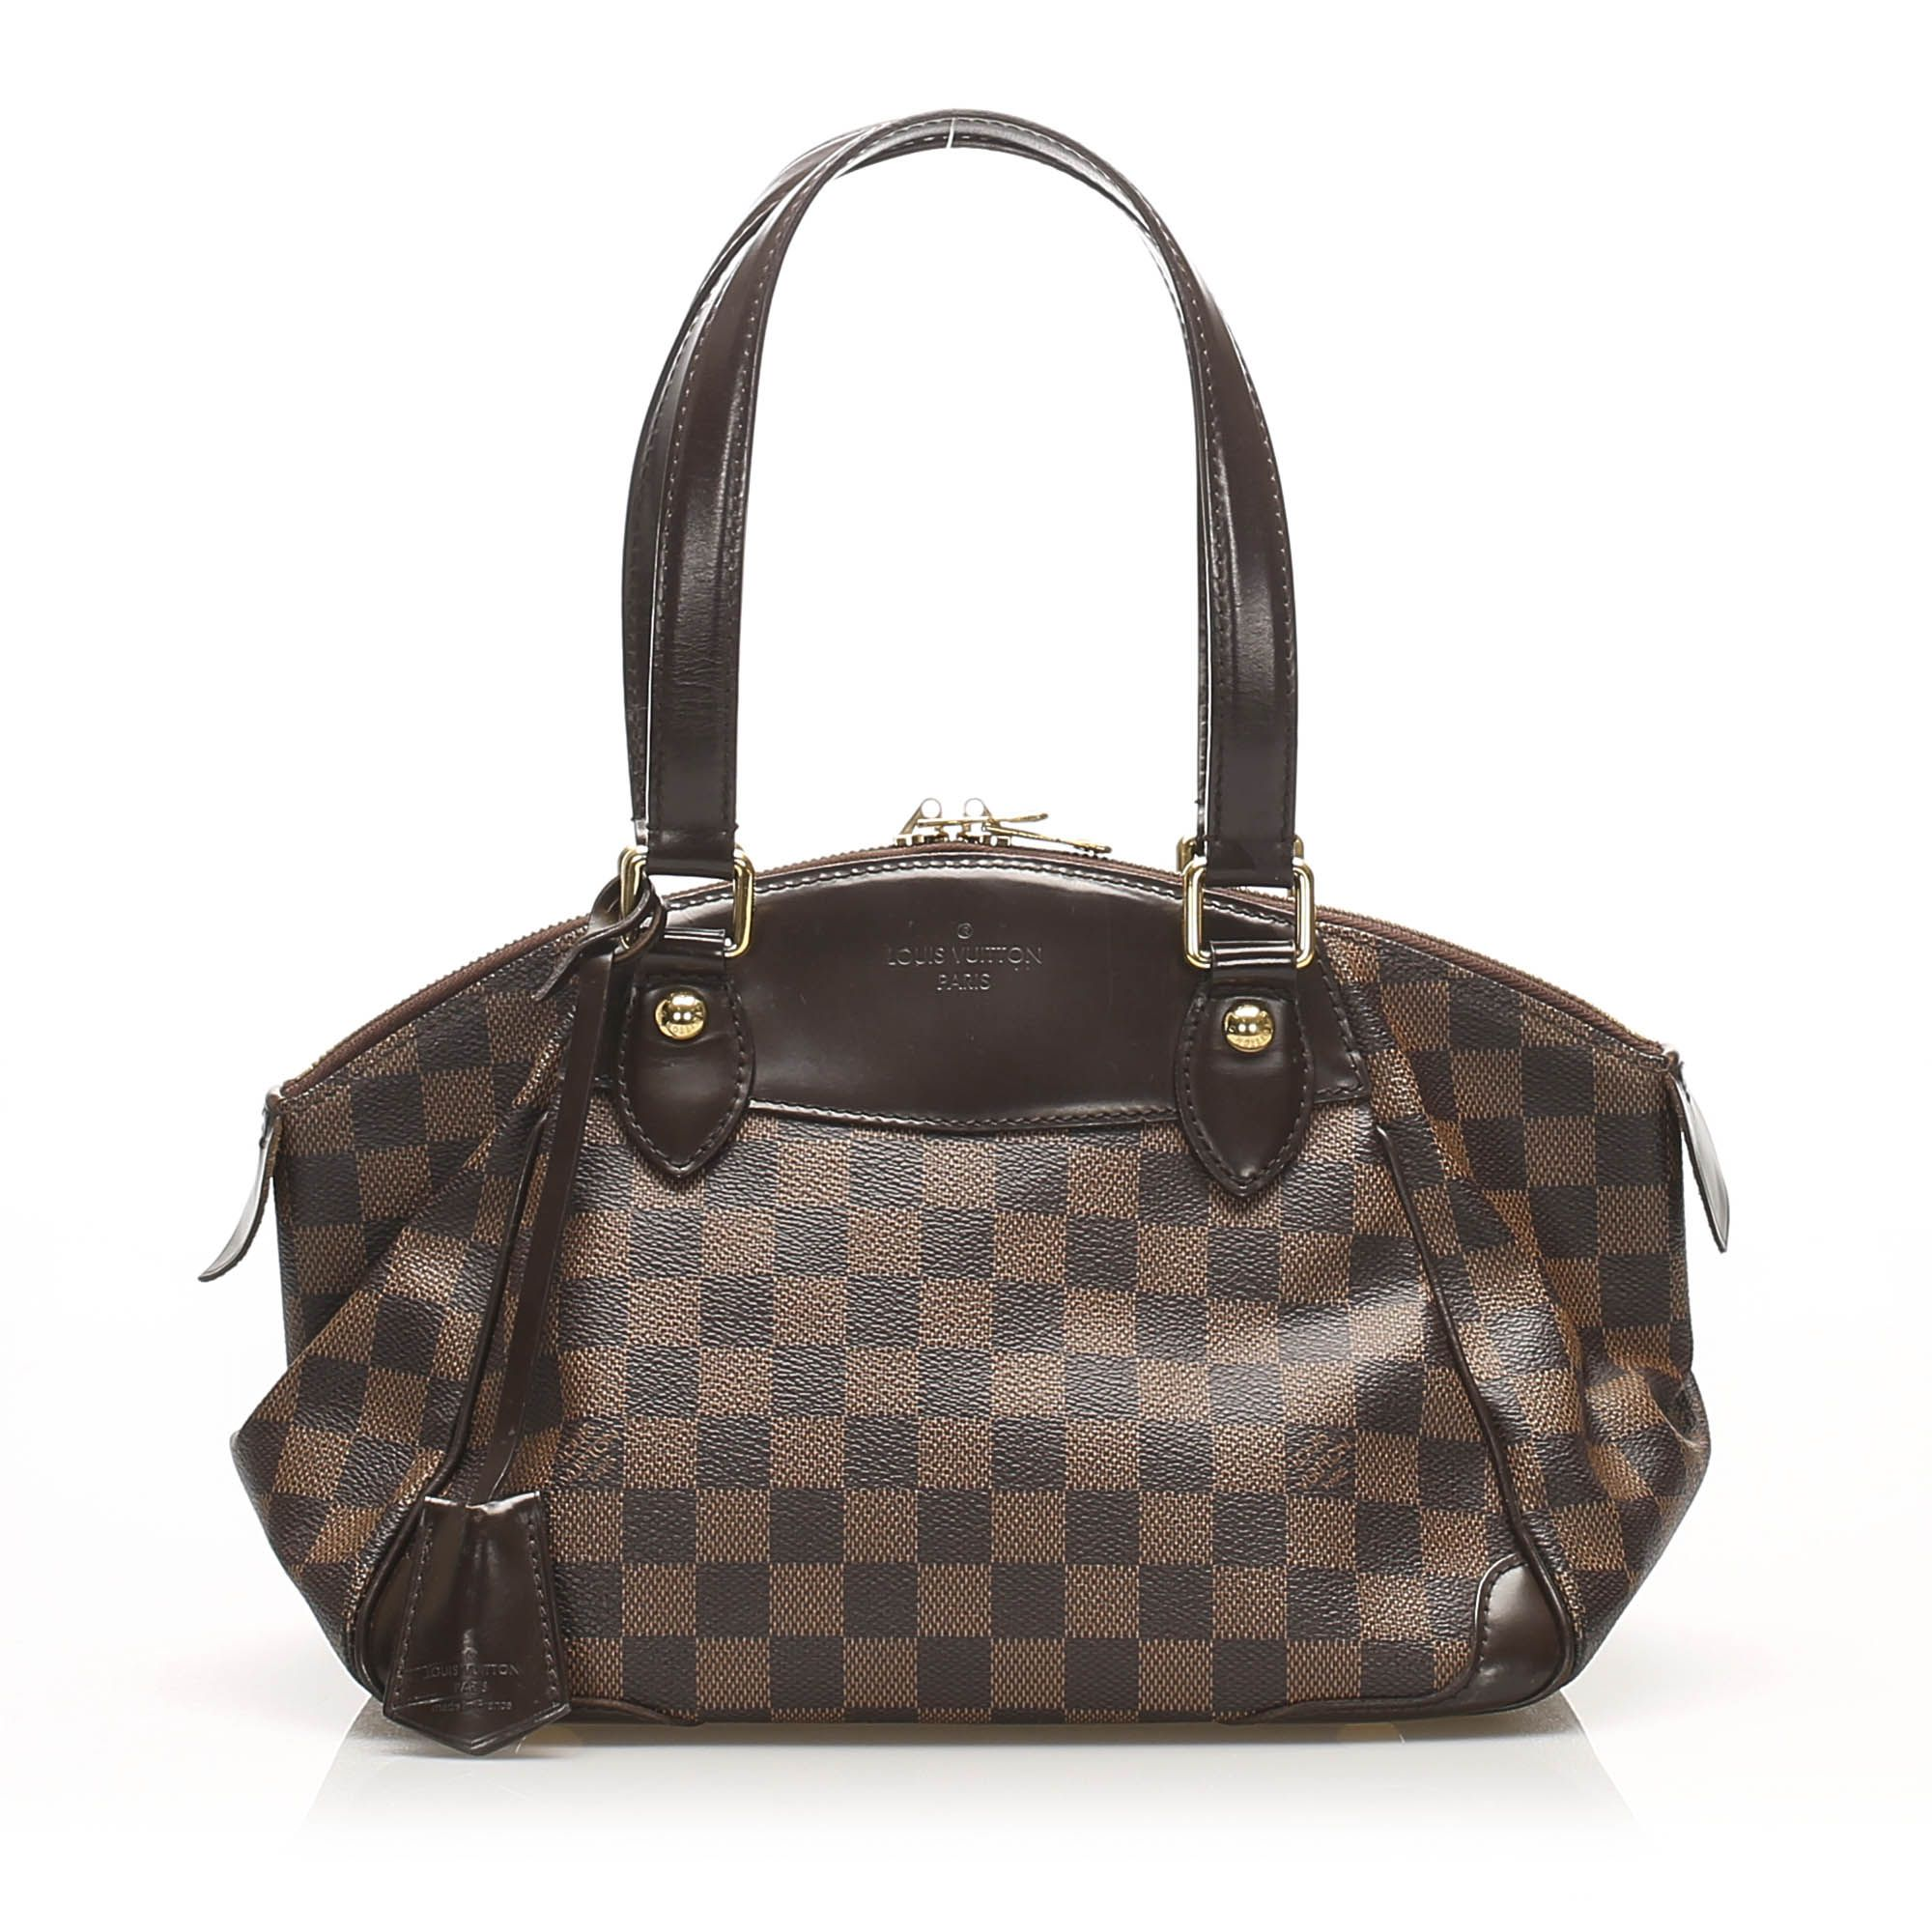 Vintage Louis Vuitton Damier Ebene Verona PM Brown